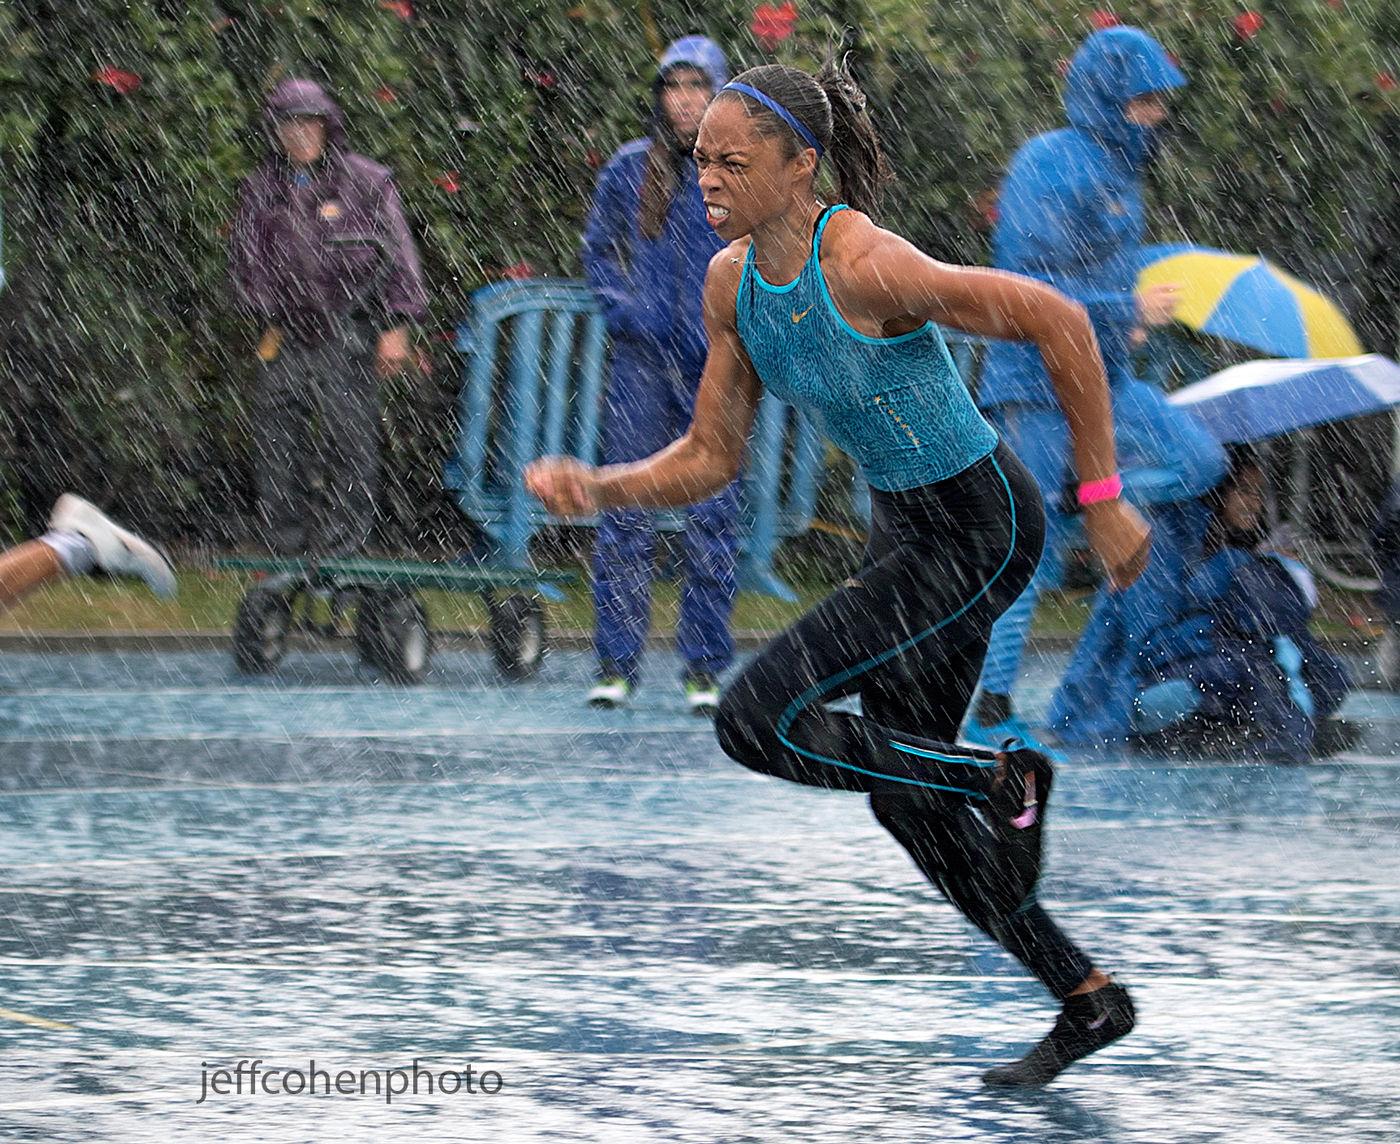 394_1jjk_rafer_4_9_16_af_4x100_rain__jeff_cohen_photo_59_web.jpg